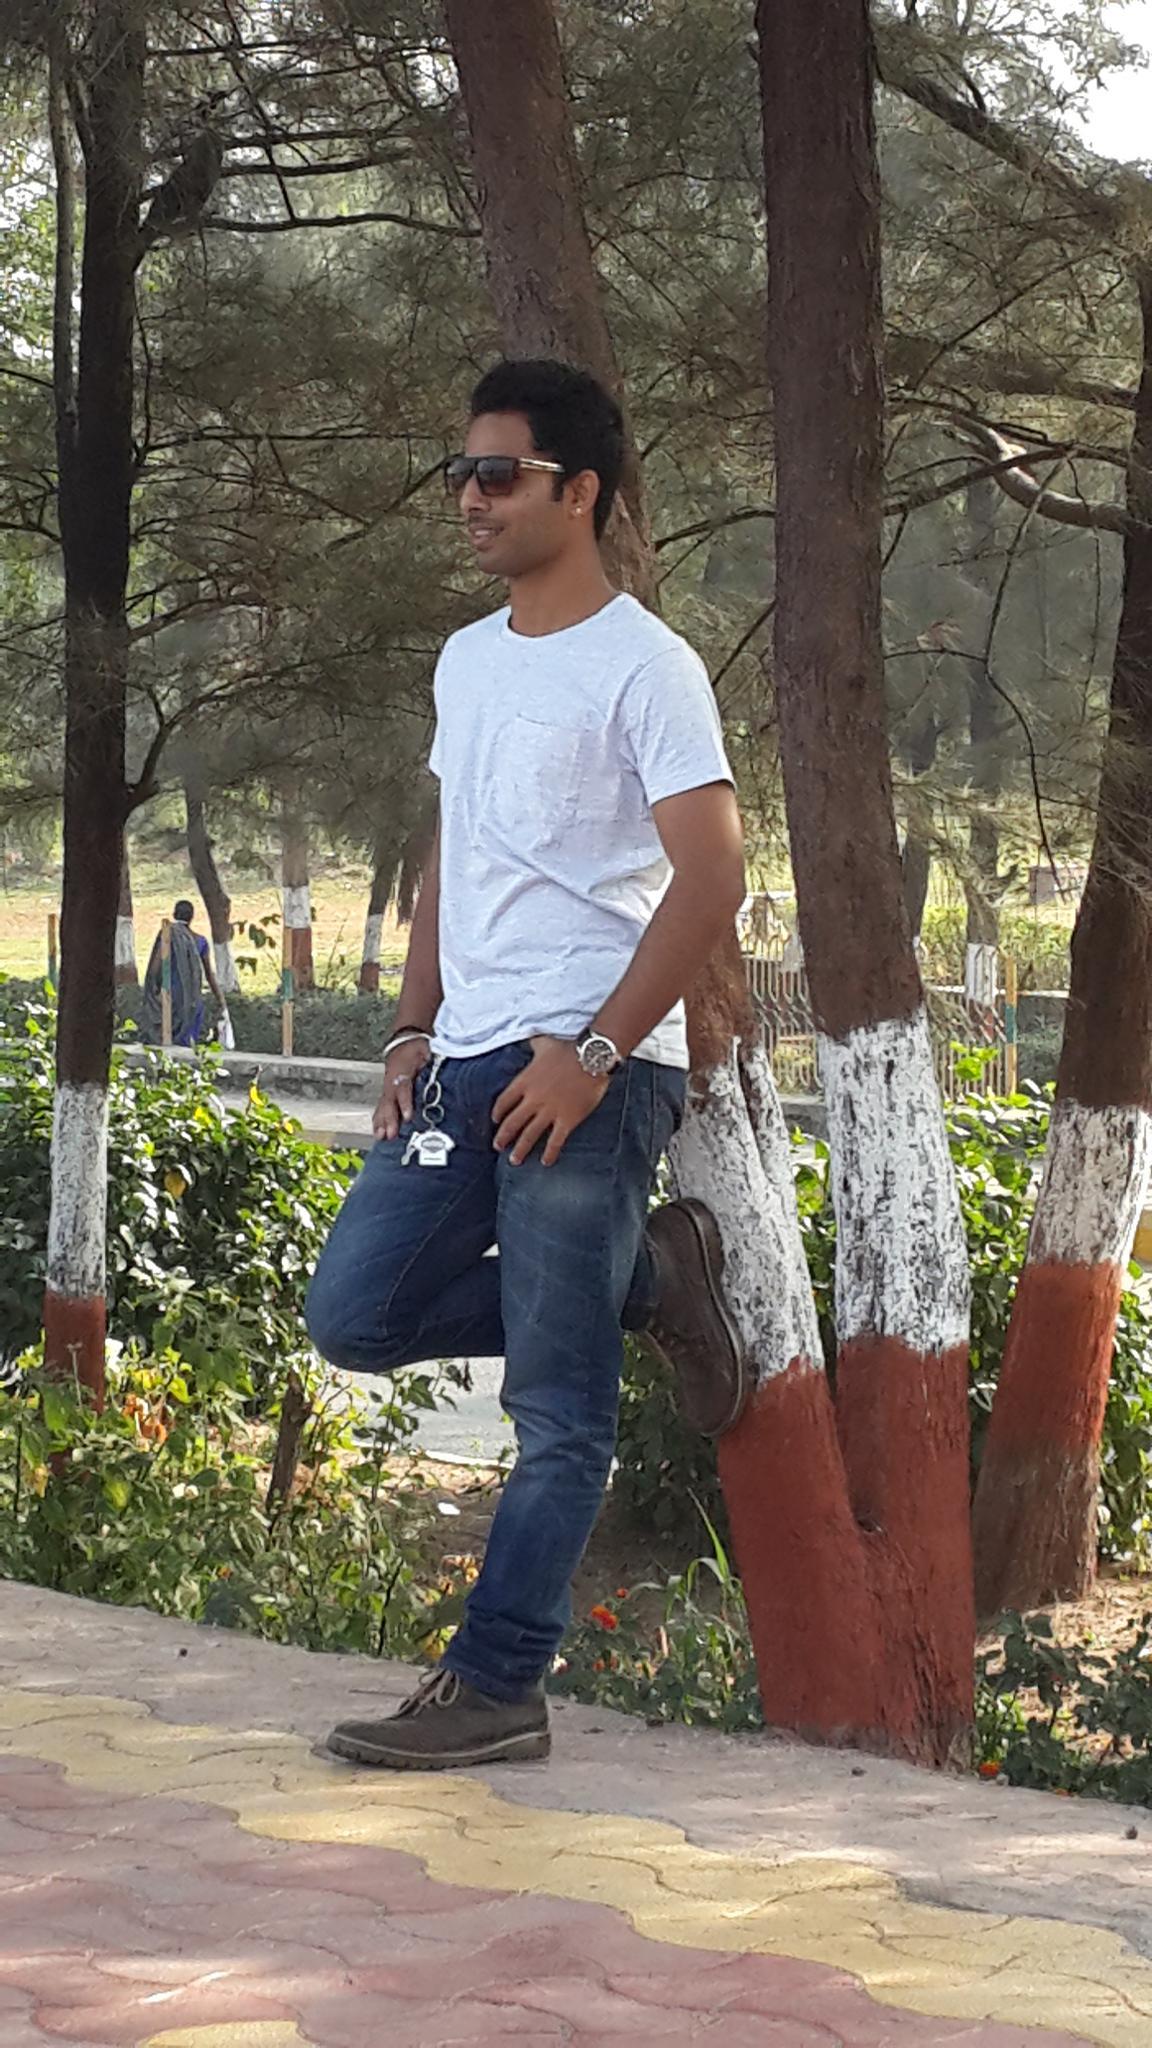 pose by Ankush Kumar Paliyal